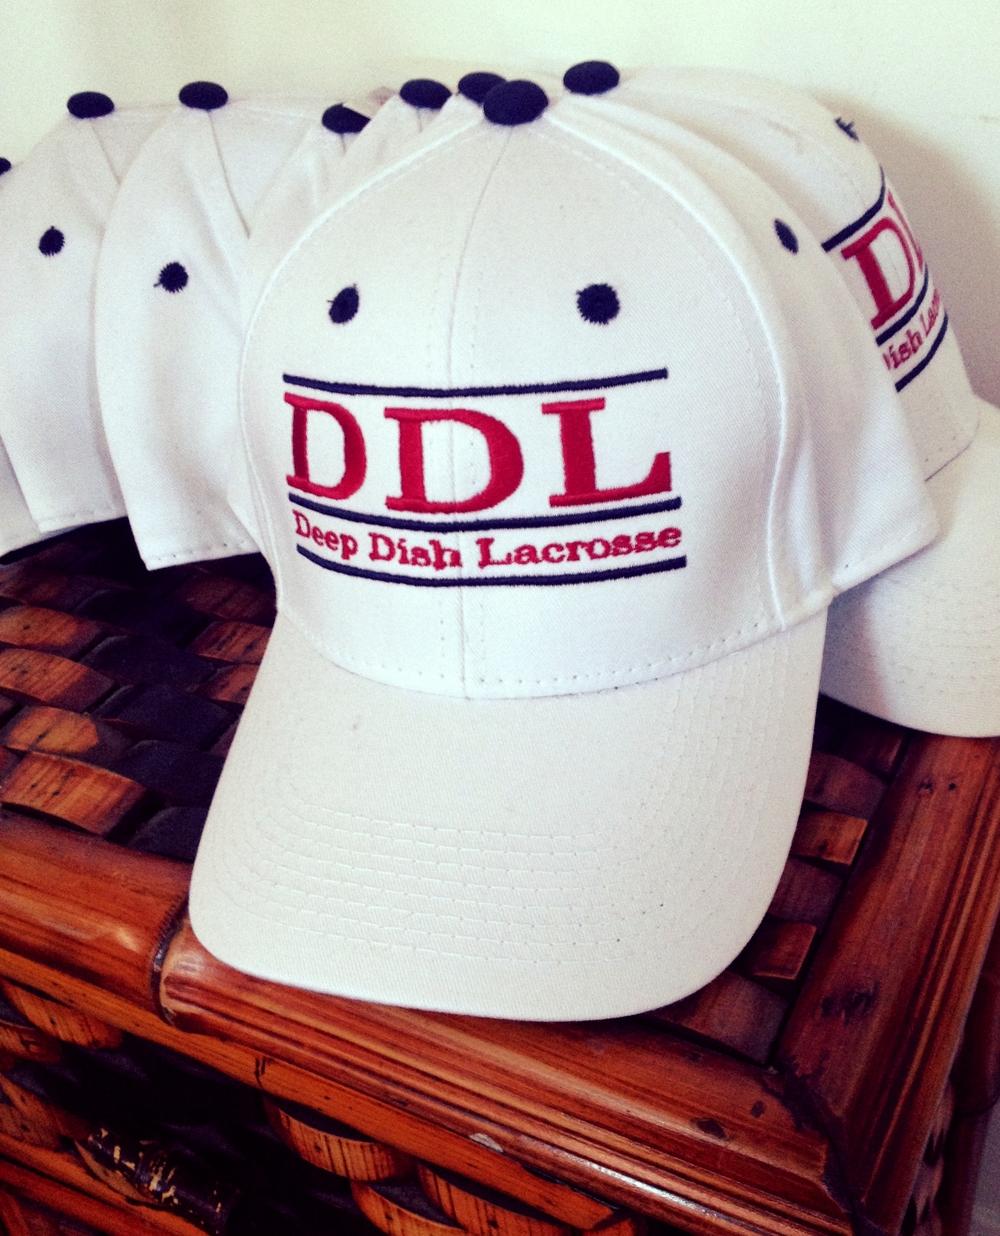 THE LOCKER ROOM | Get your Deep Dish Gear